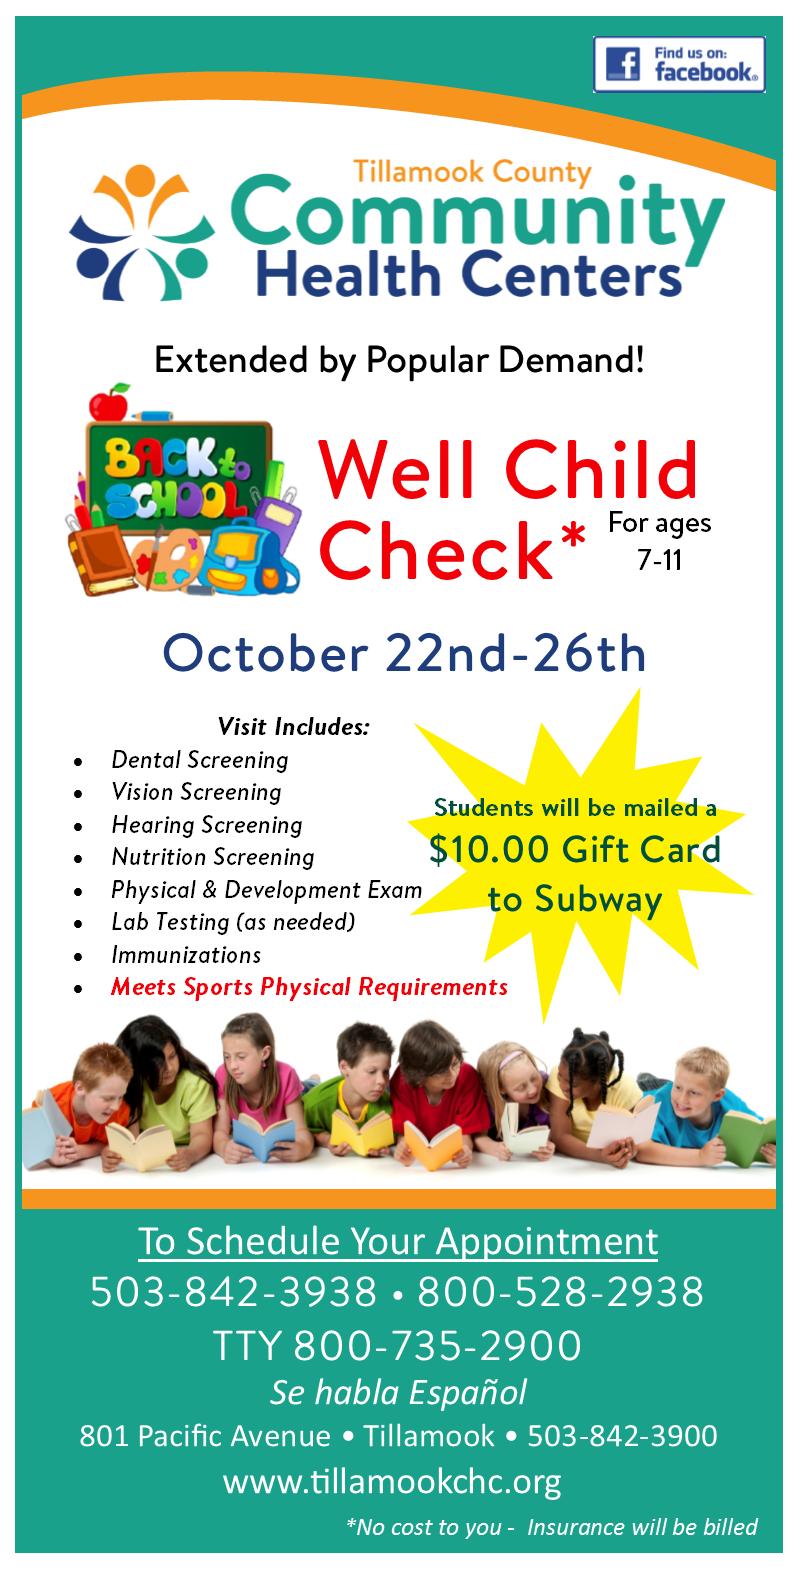 Well Child Exams 7 11 Yrs Oct 22 26 Hh No Logo Tillamook